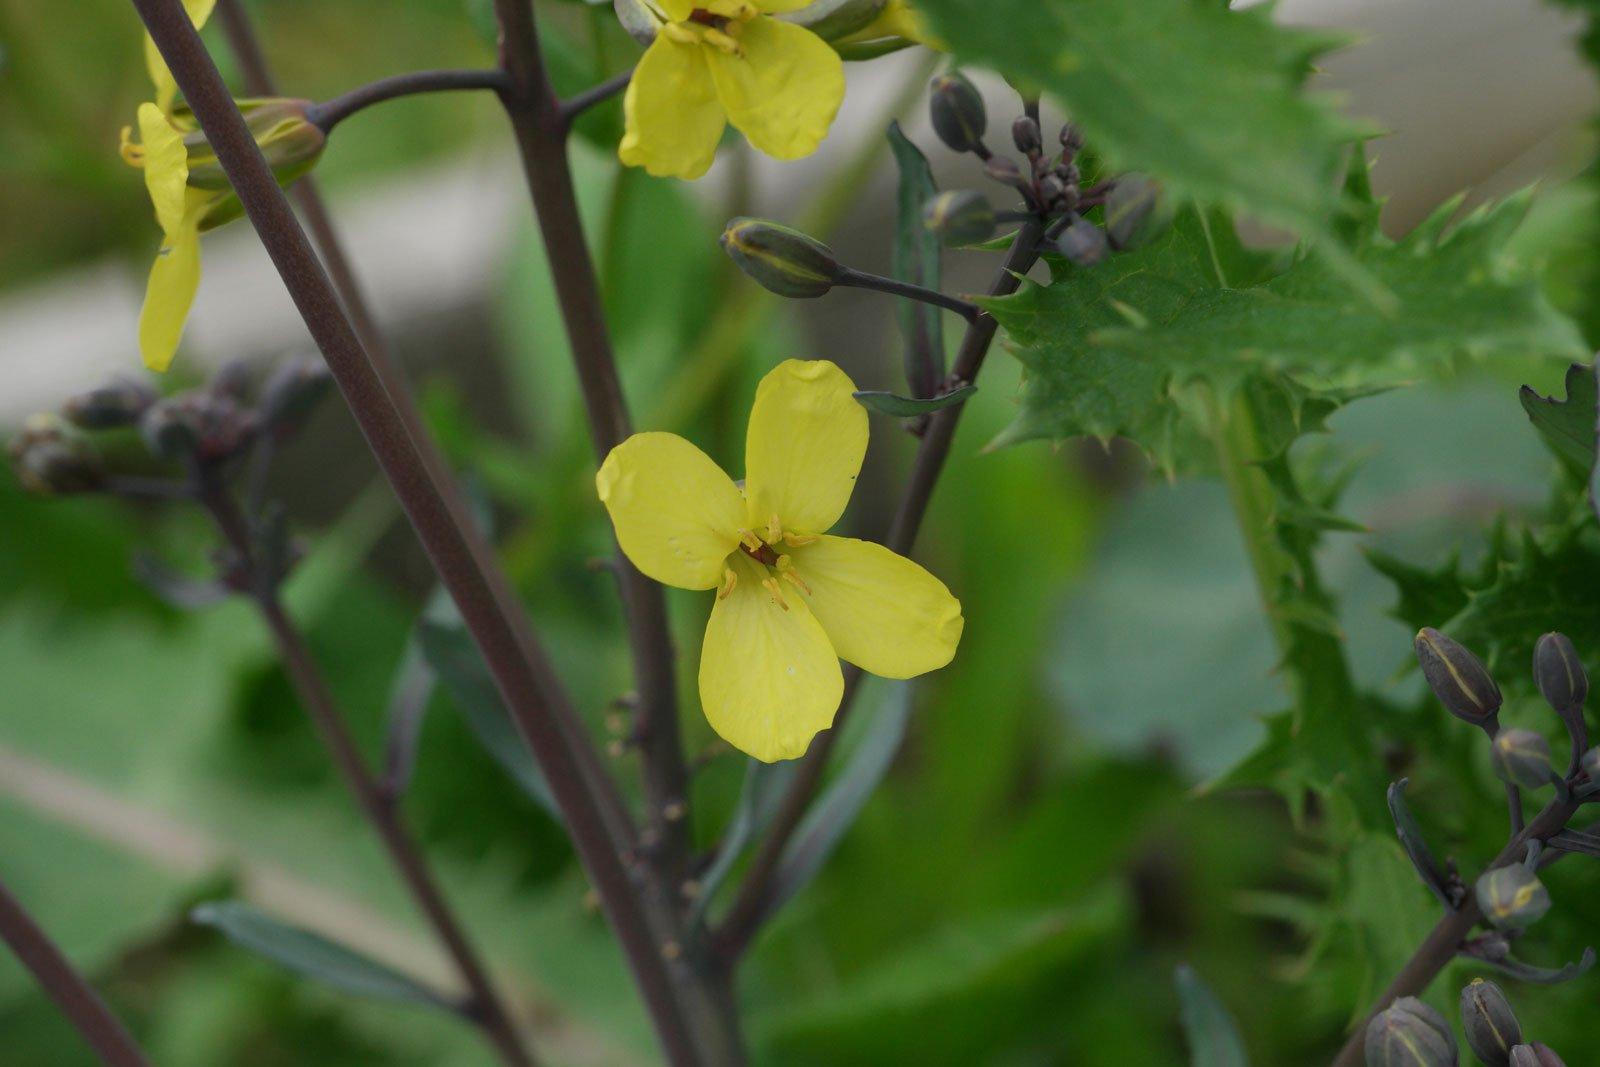 Brassica oleracea convar. capitata var. rubra